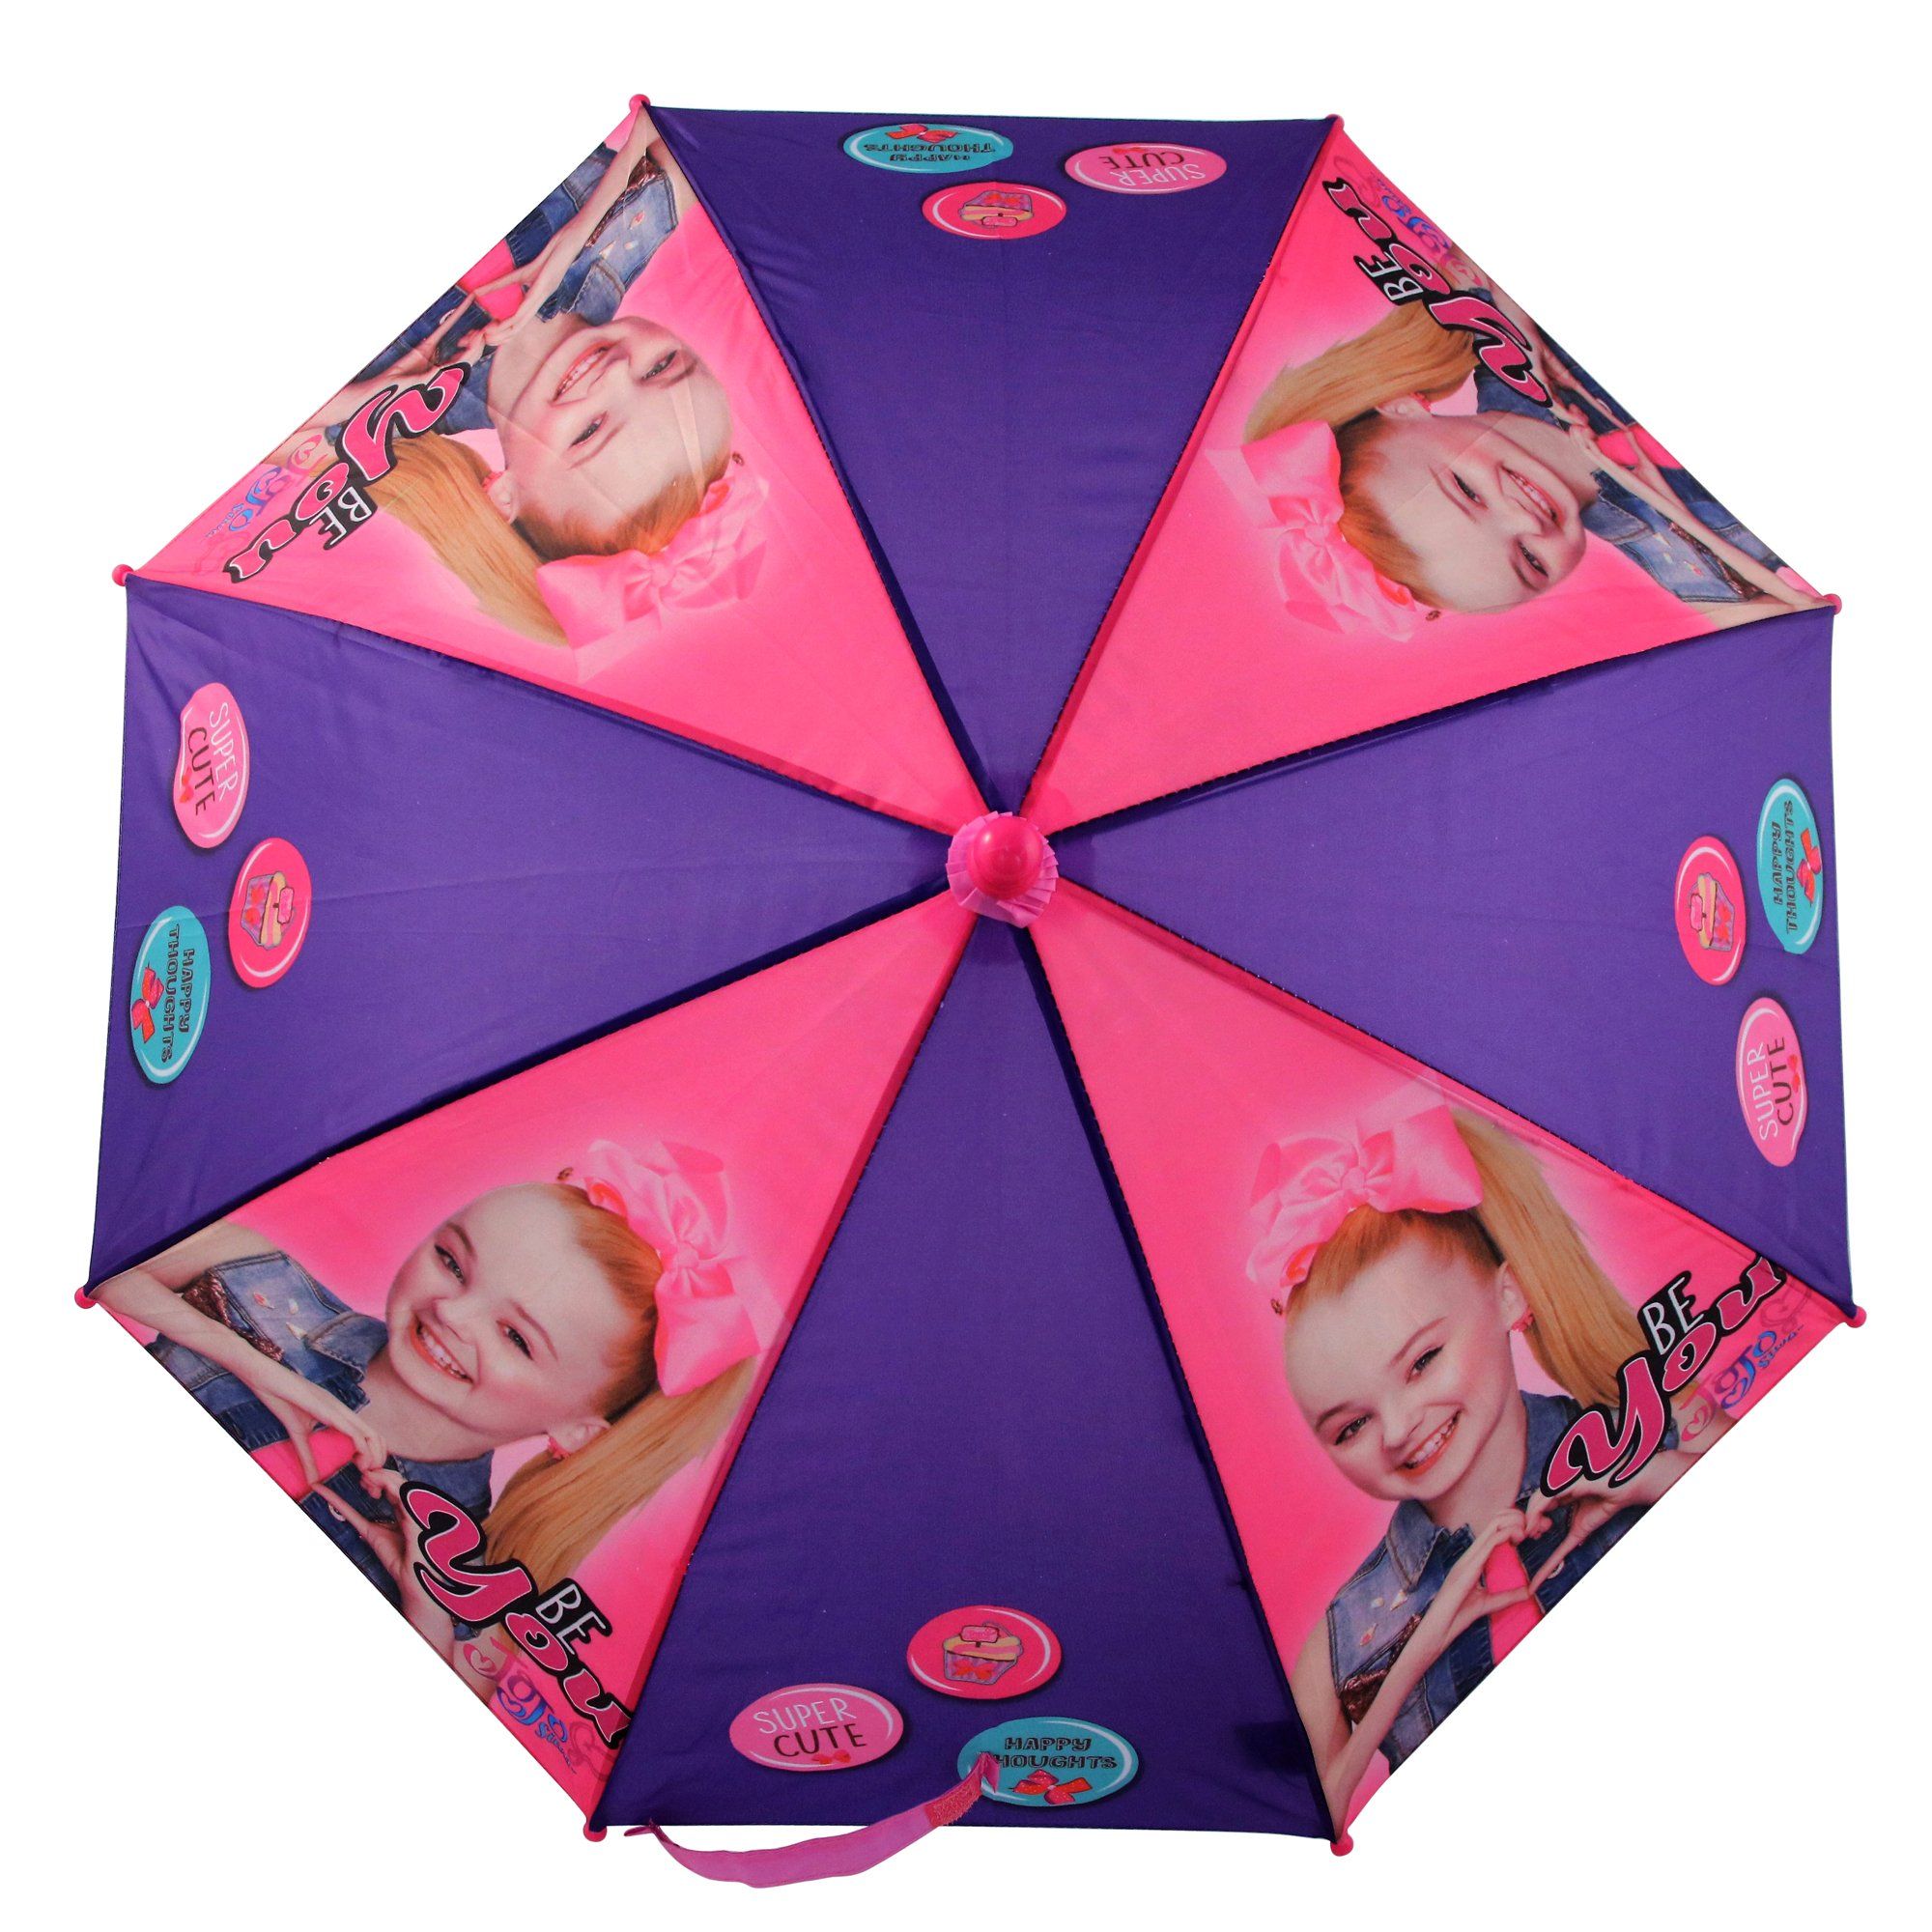 Nickelodeon Little Girls' Jojo Siwa Rainwear Character Umbrella, Purple/Pink, Age 3-7 by Nickelodeon (Image #5)